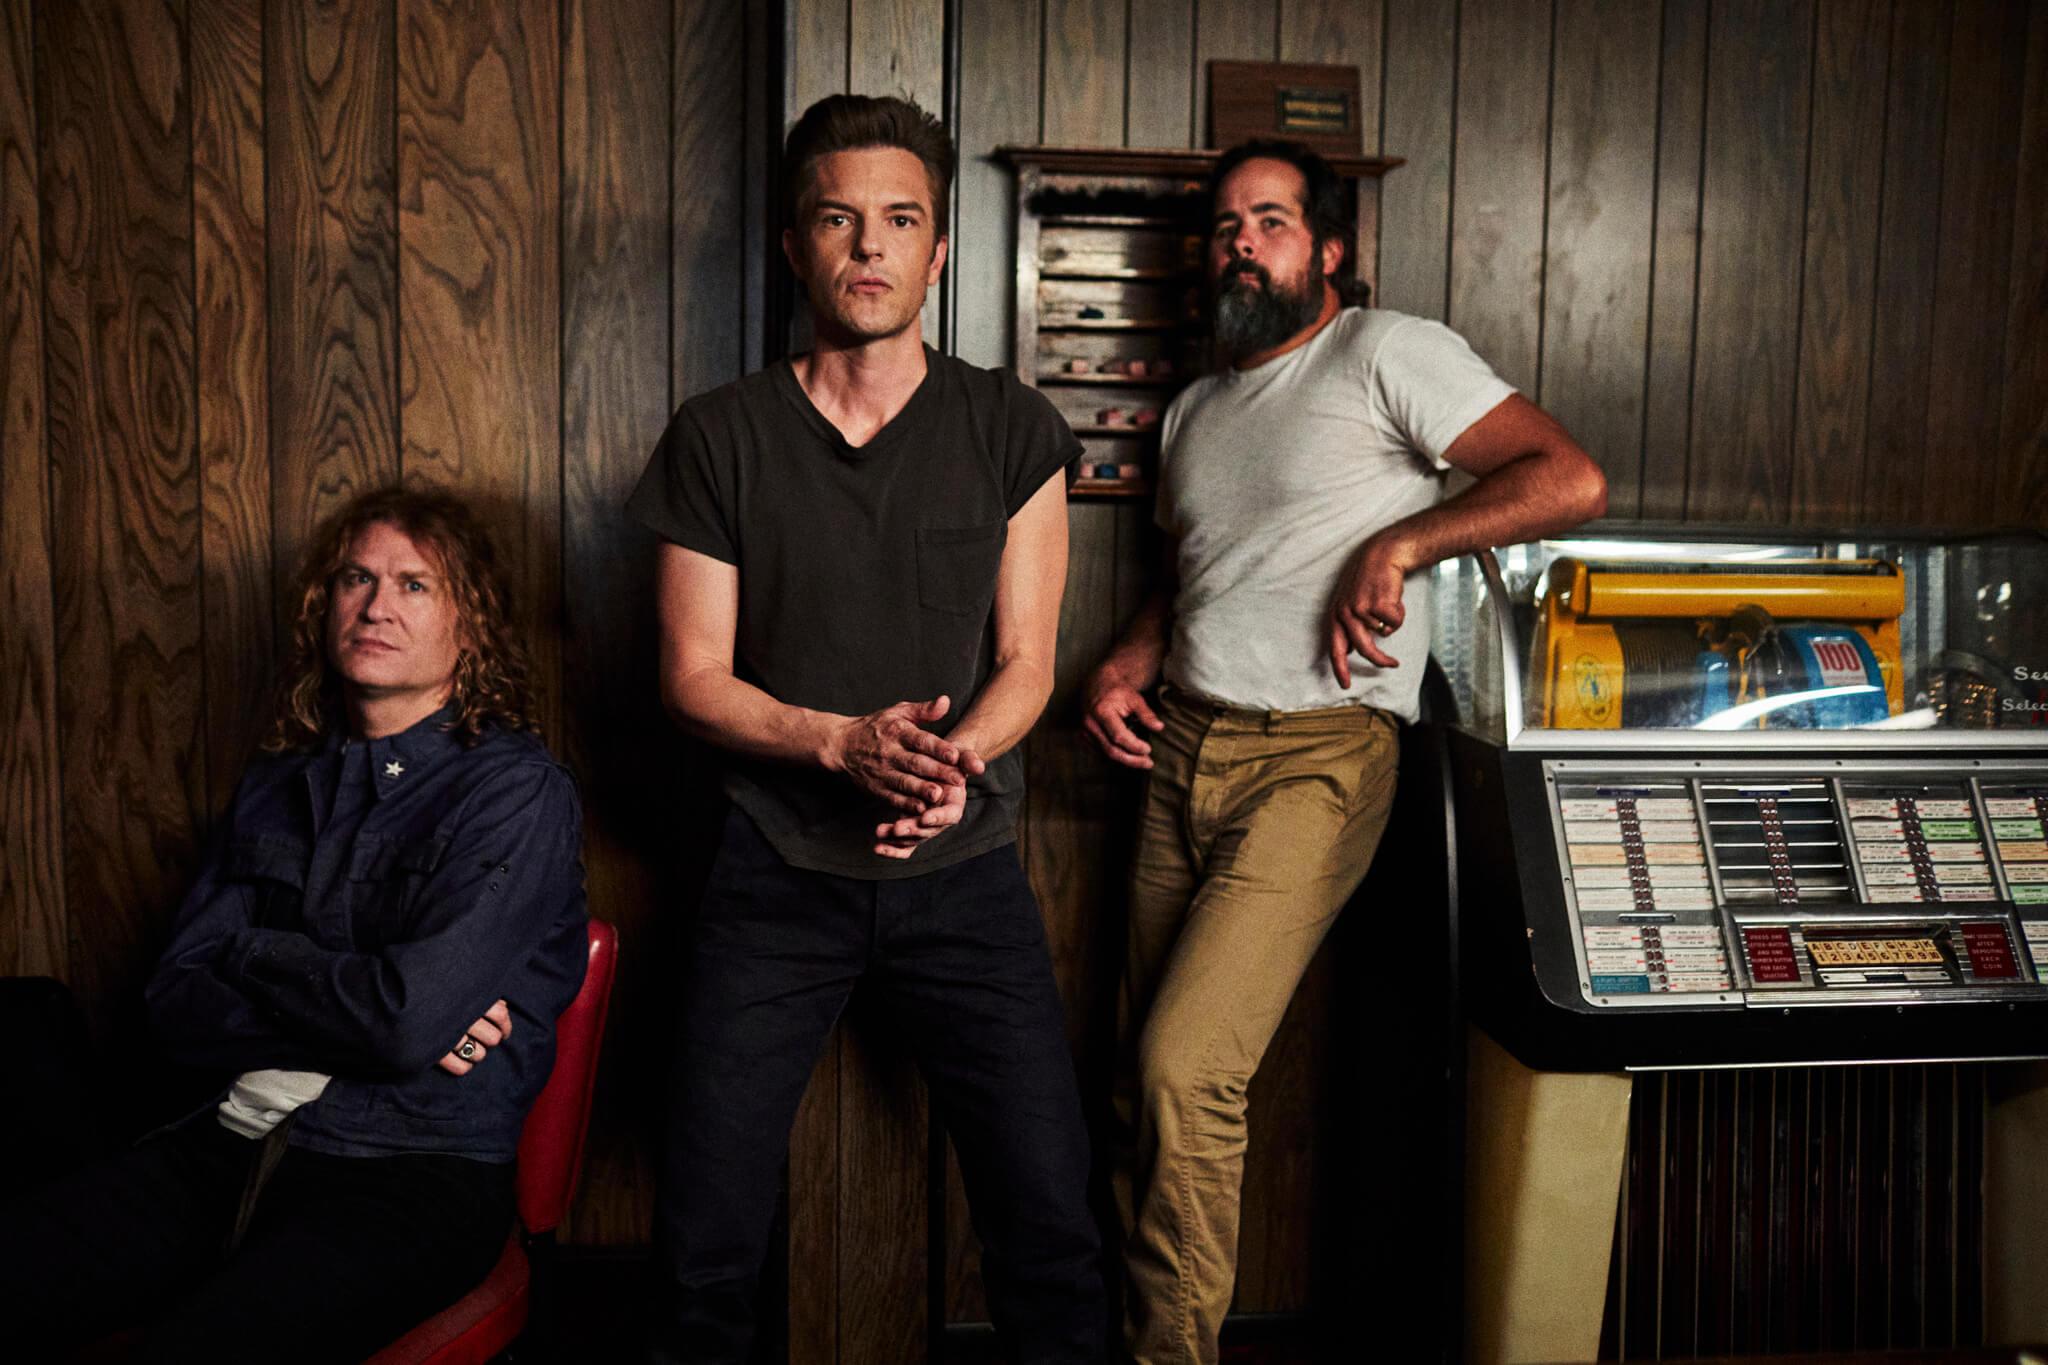 The Killersが最新アルバム『Pressure Machine』でデビューから7作連続全英1位を獲得、全米アルバムチャートでも全作トップ10入りの快挙!